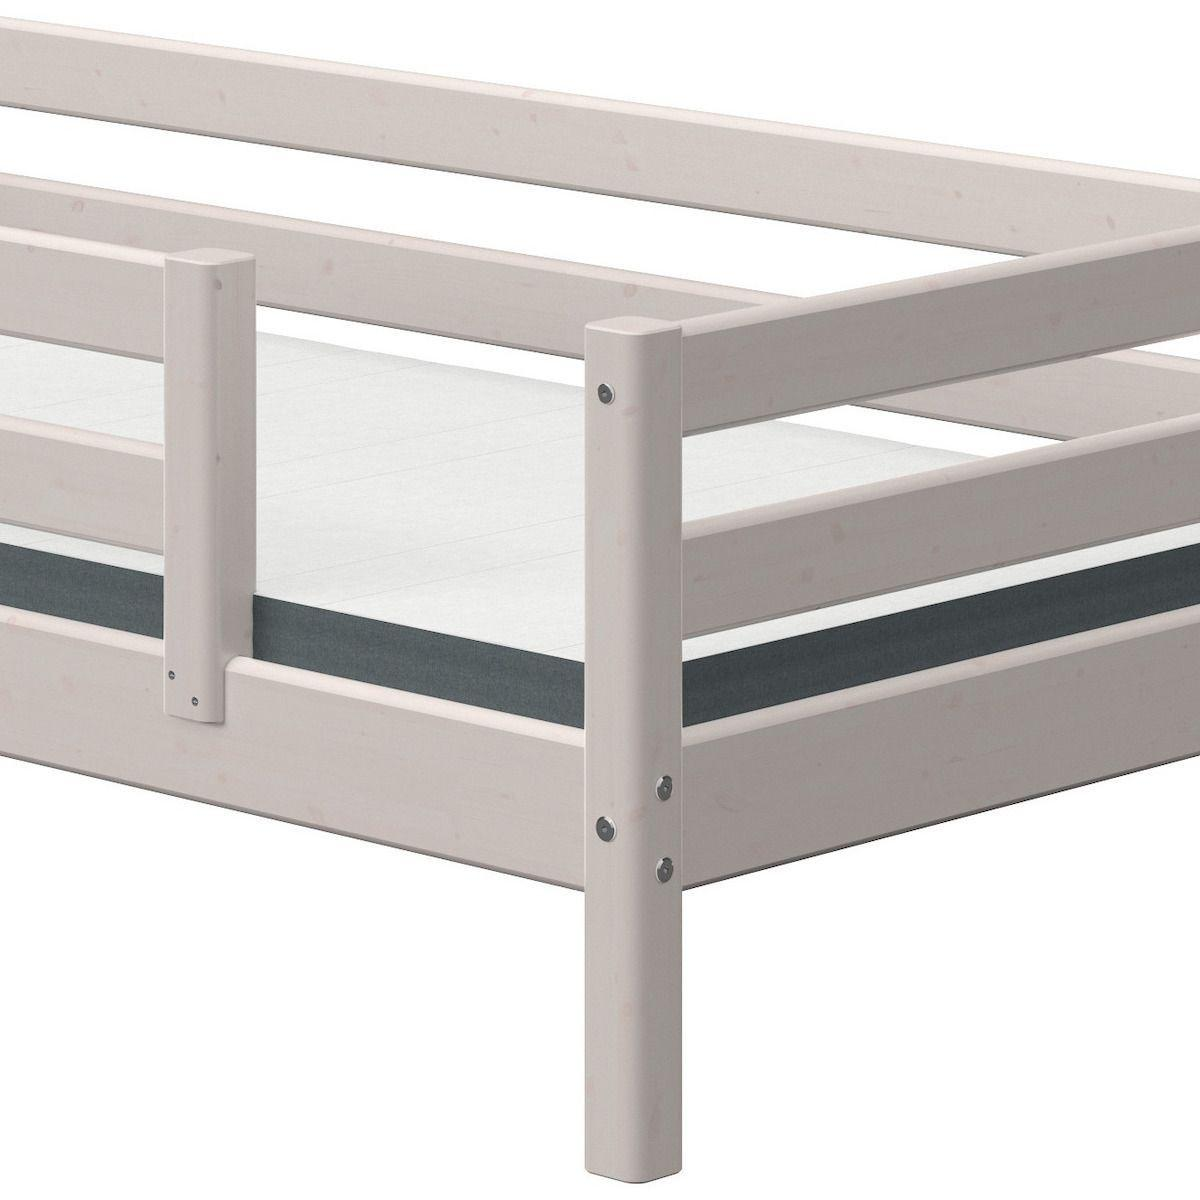 Cama-sofá 90x190cm barrera seguridad centrada CLASSIC Flexa grey washed